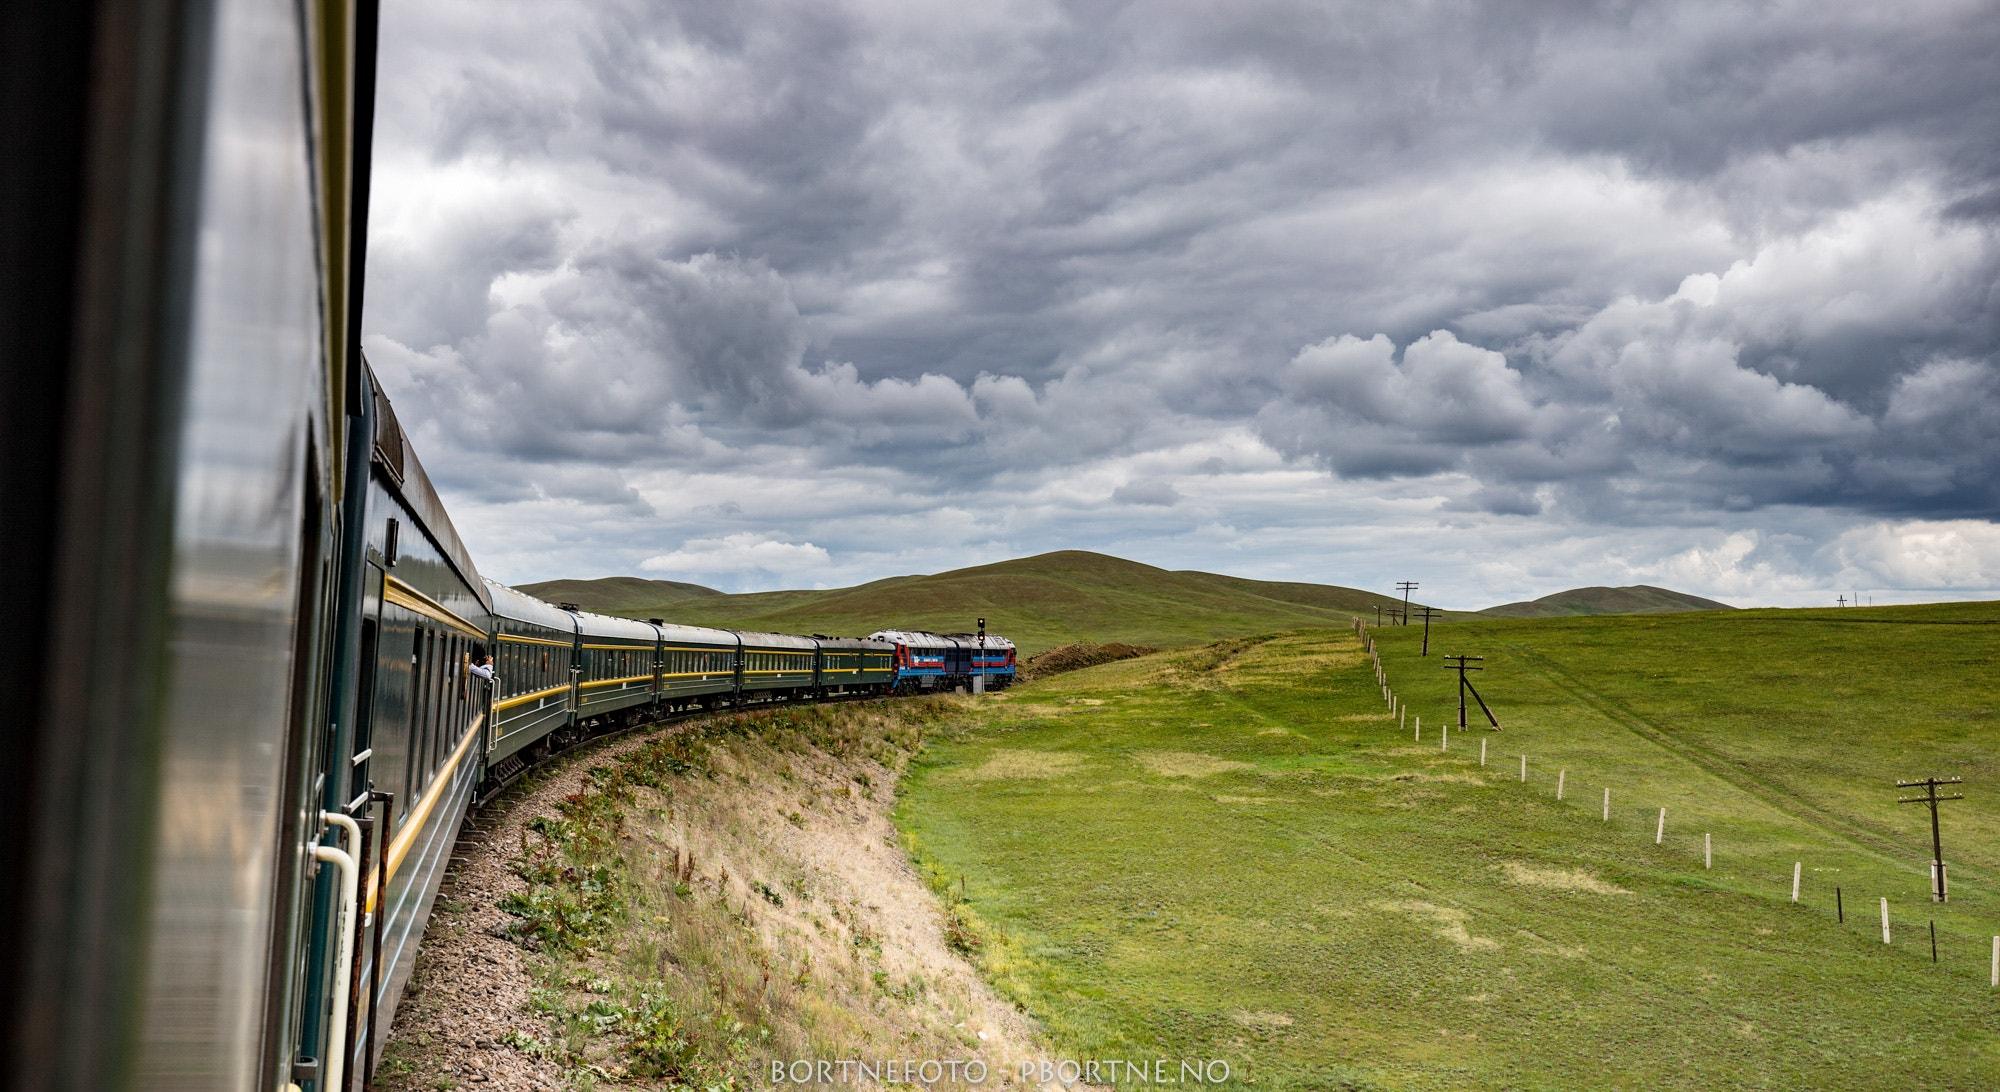 nyegolfsko-transmongolian-railway-through-the-gobi-desert.jpg